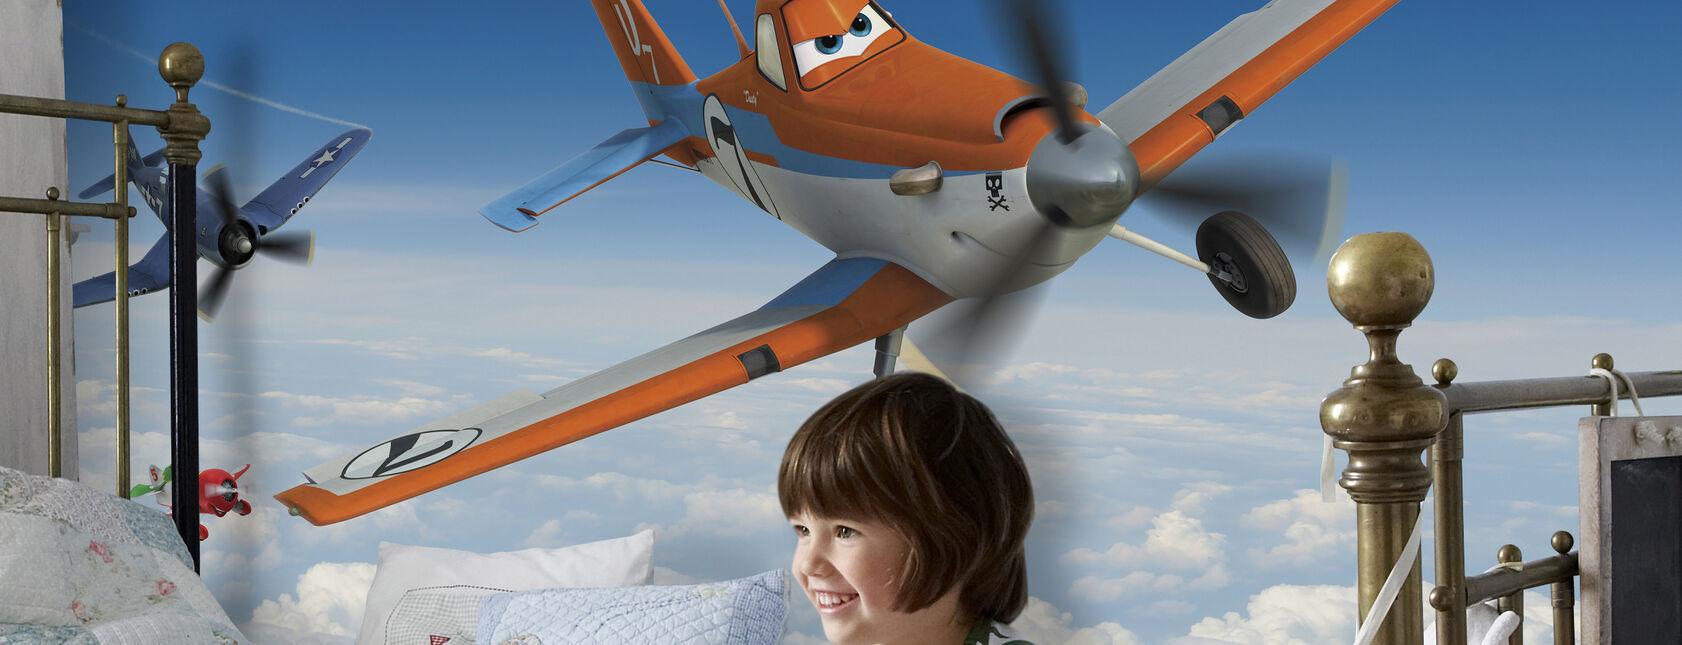 Disney – Flygplan